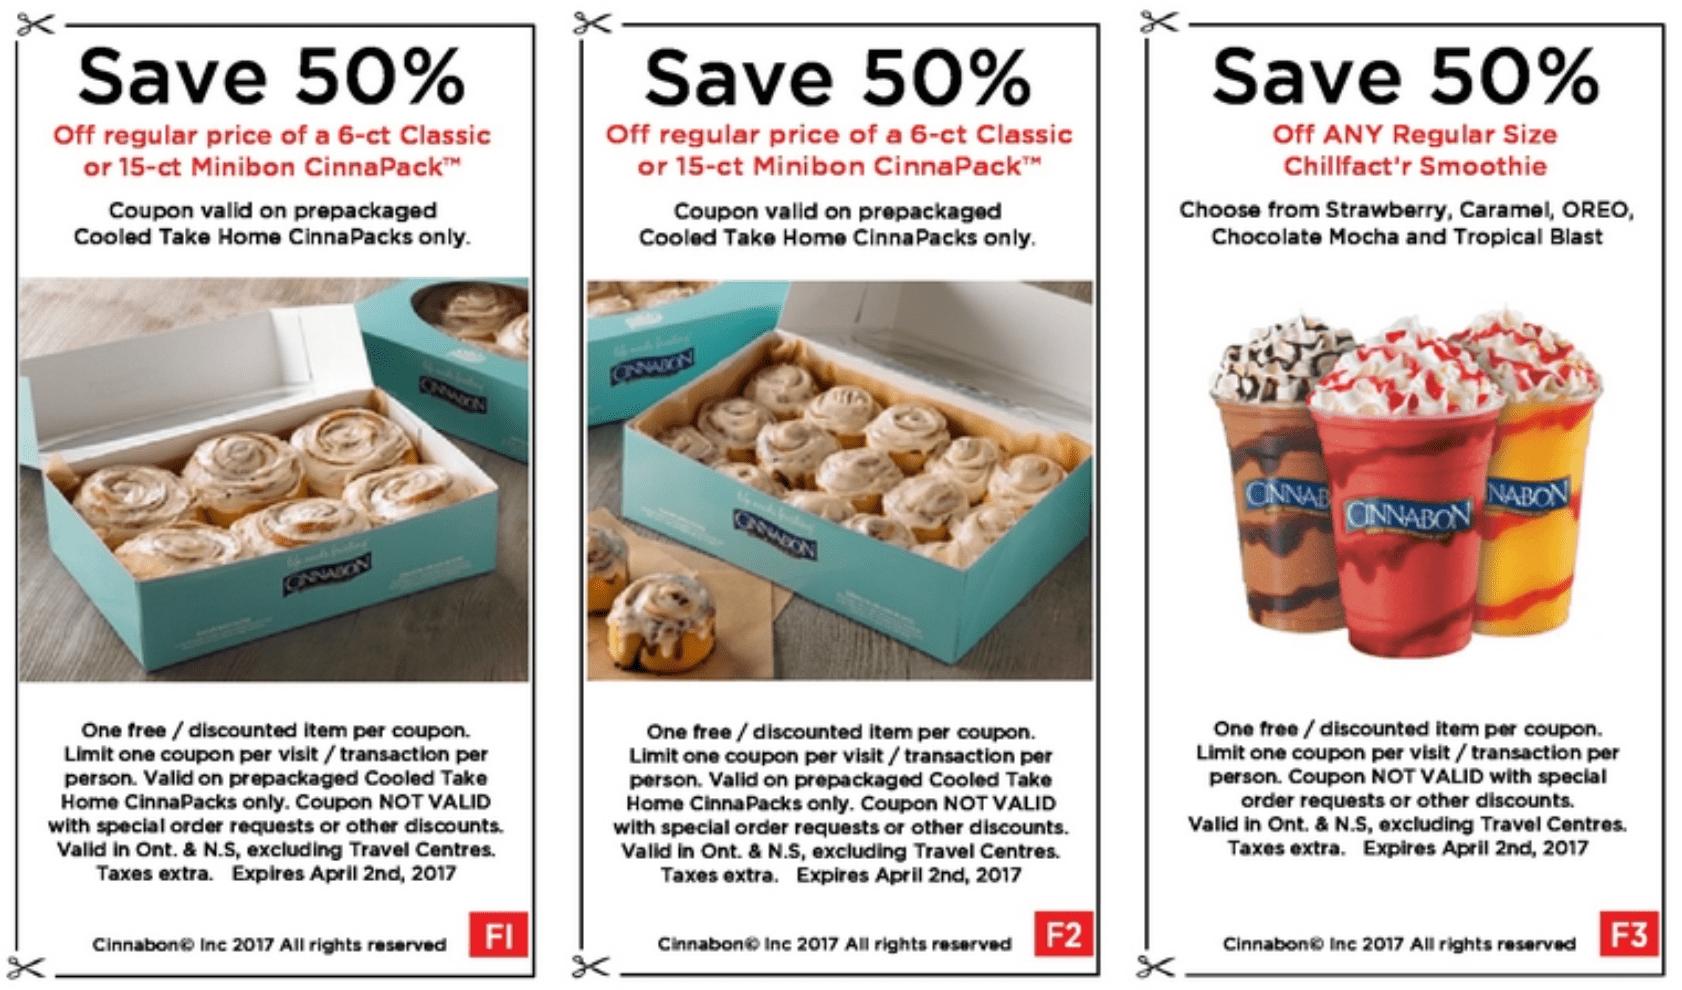 Cinnabon Canada Coupons: Save 50% Off Minibon CinnaPack